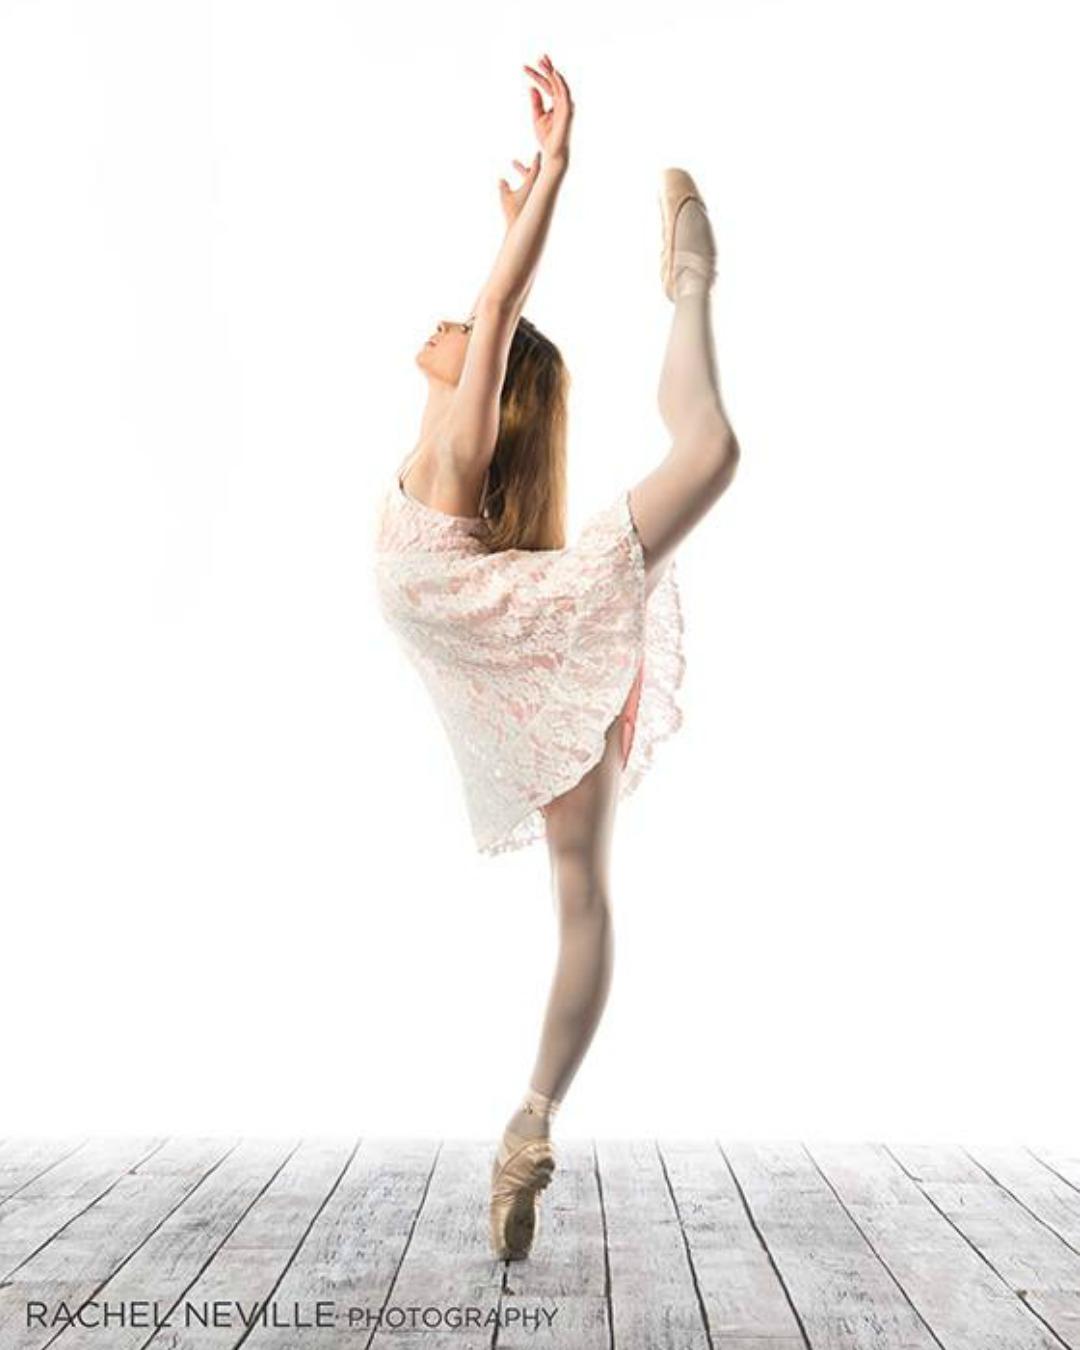 Ballerina-Juliette-Bosco-Ellison-Ballet-Photo-by-Rachel-Neville-Photography-wallpaper-wp423902-1